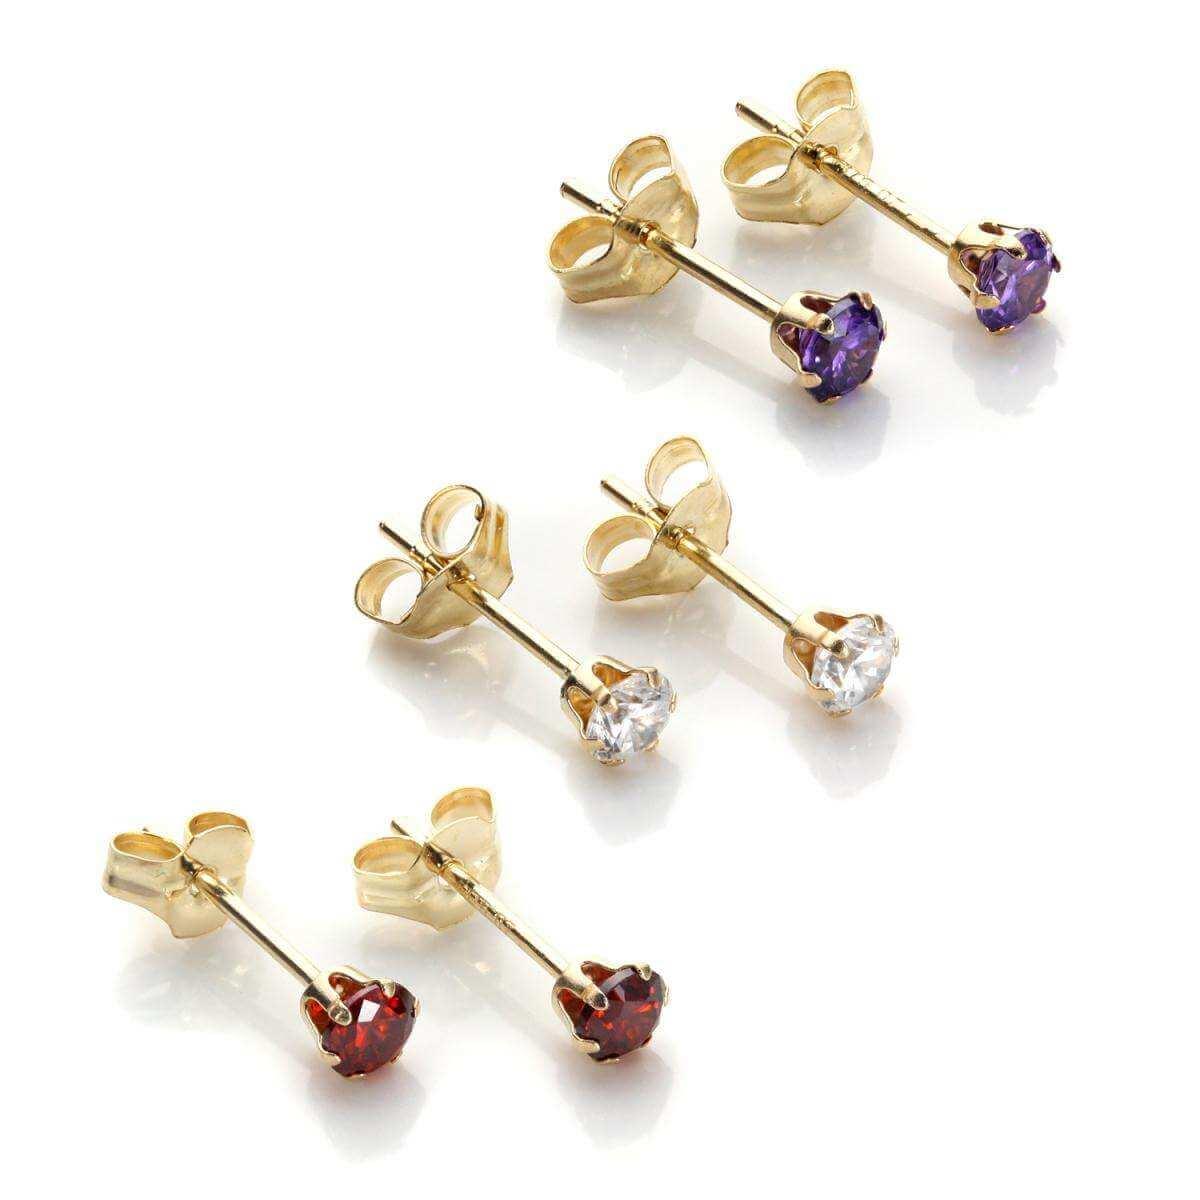 9ct Gold 3mm Crystal Stud Earrings Set